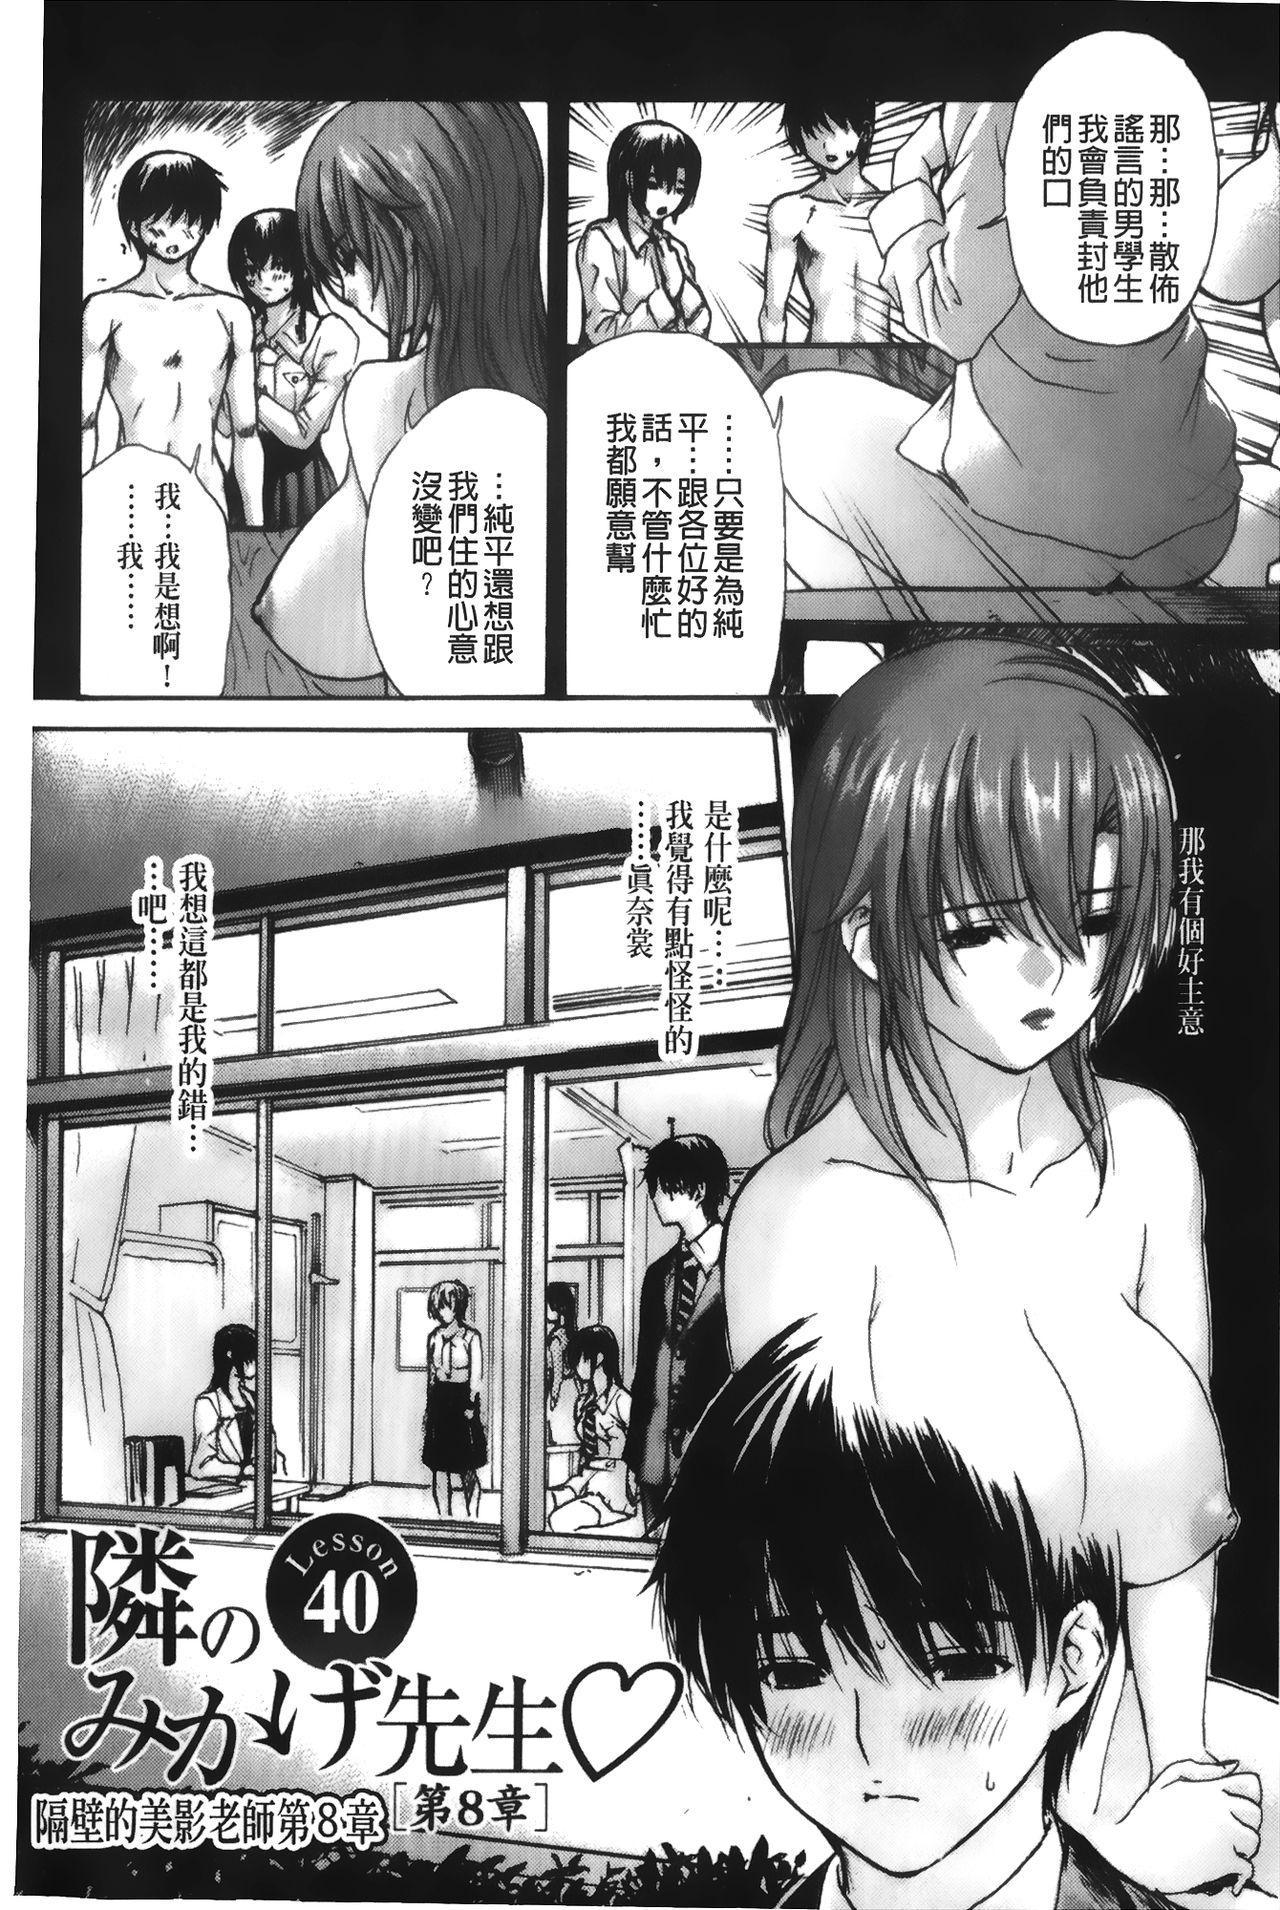 Tonari no Minano Sensei 4 | 隔壁的美奈乃老師 4 171